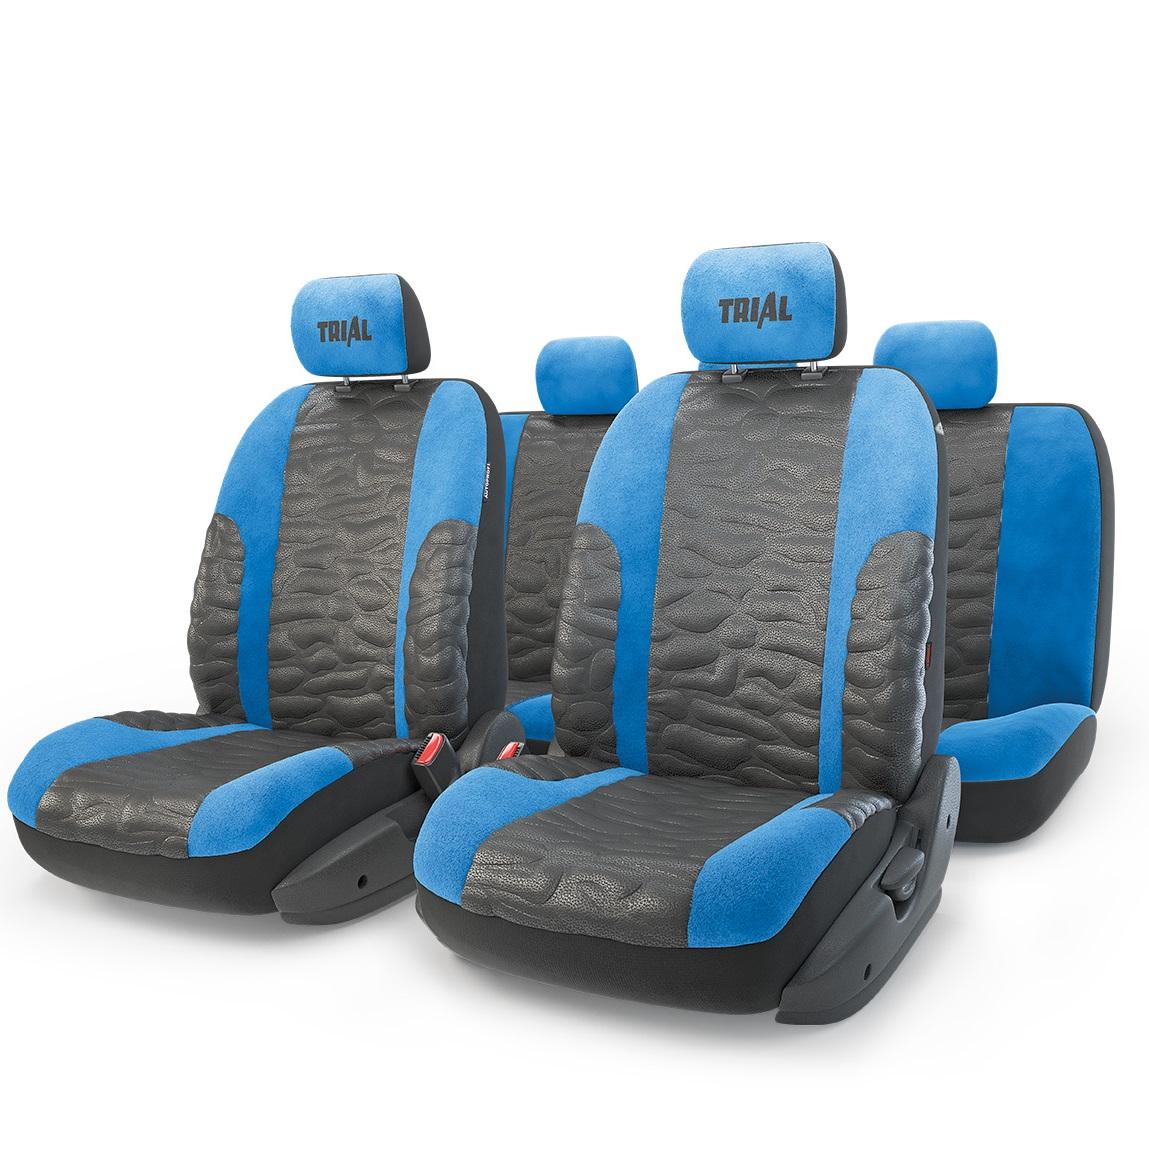 Чехол на сиденье Autoprofi Trl-1105 bk/bl (m) чехол на сиденье autoprofi mtx 1105 bk d gy m